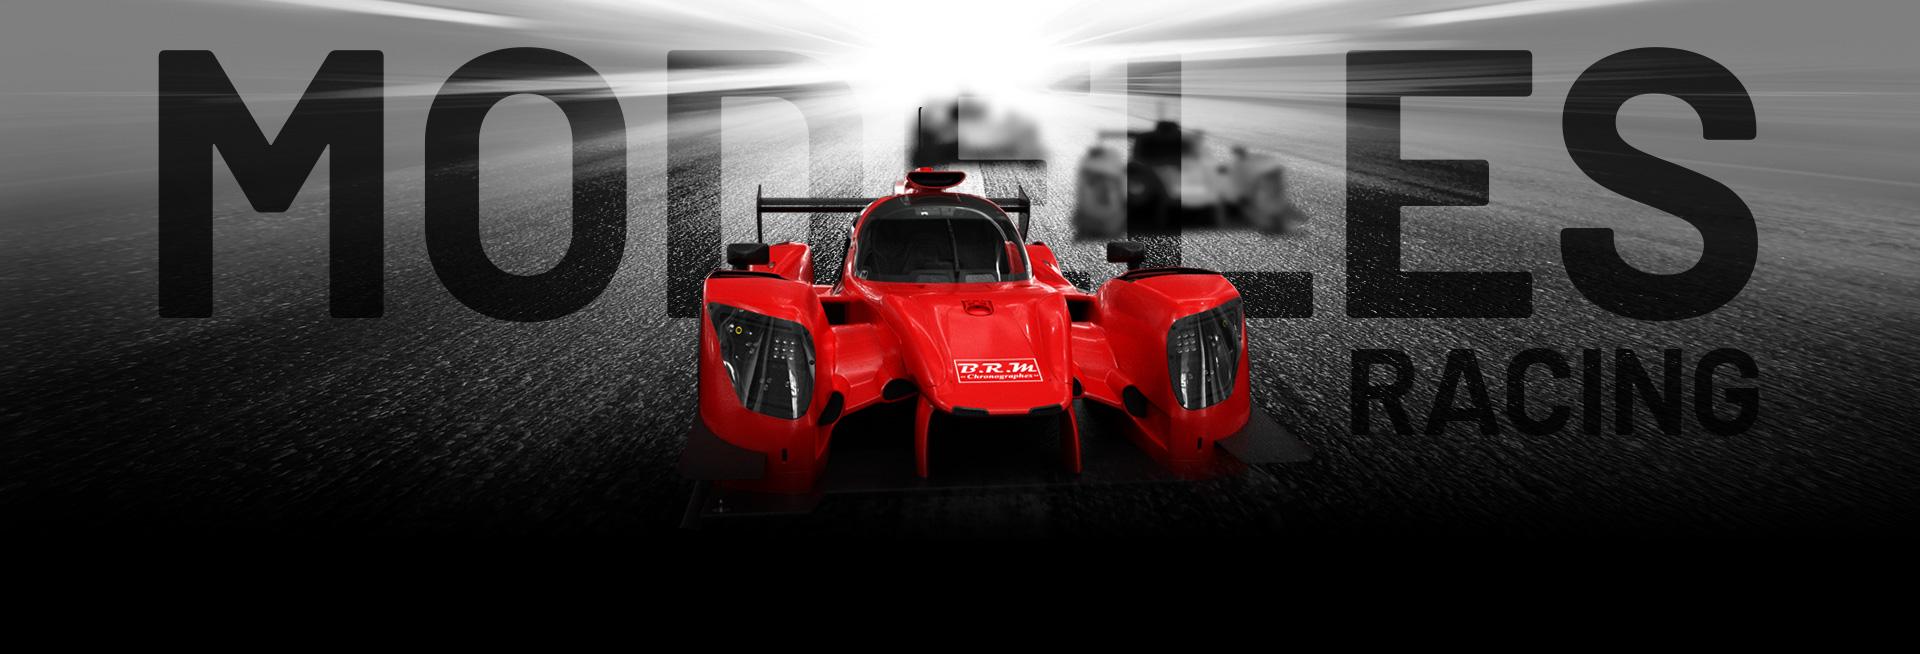 Modèles - Racing